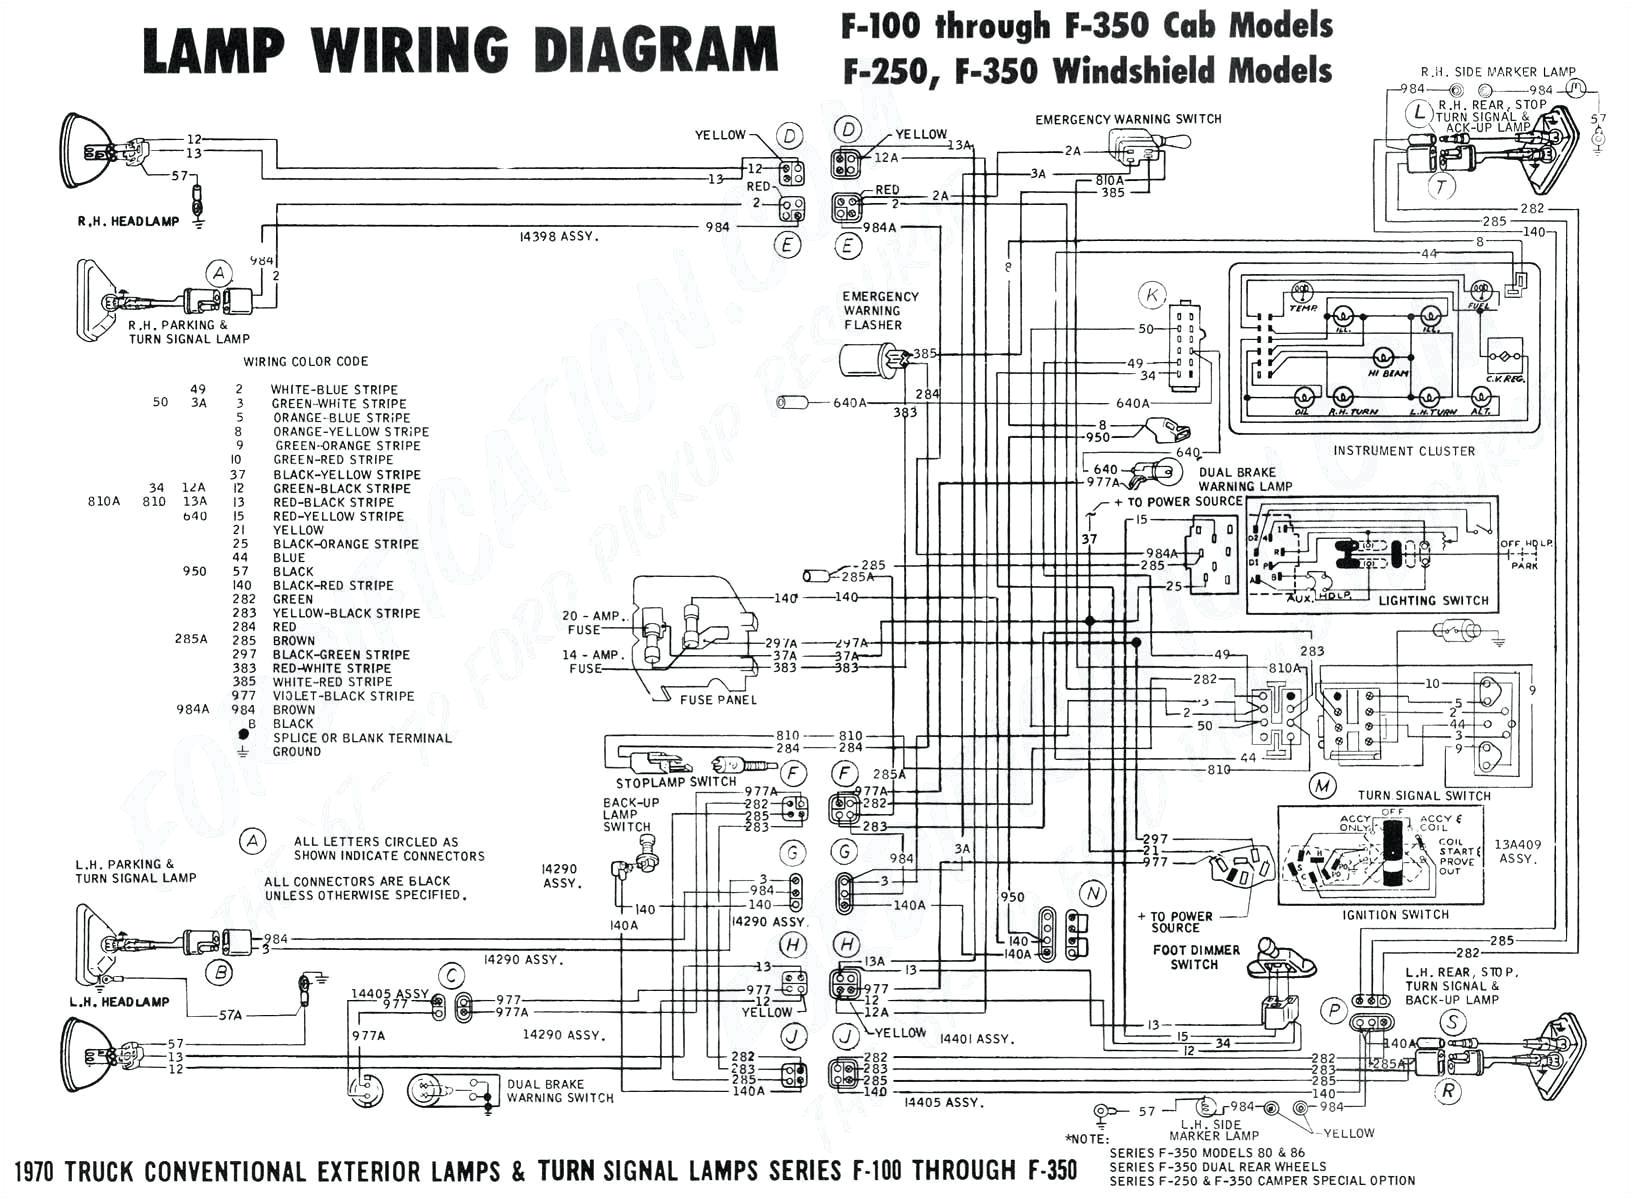 2000 ford excursion 4x4 wiring diagram wiring diagram 2000 excursion wiring diagram electrical schematic wiring diagram